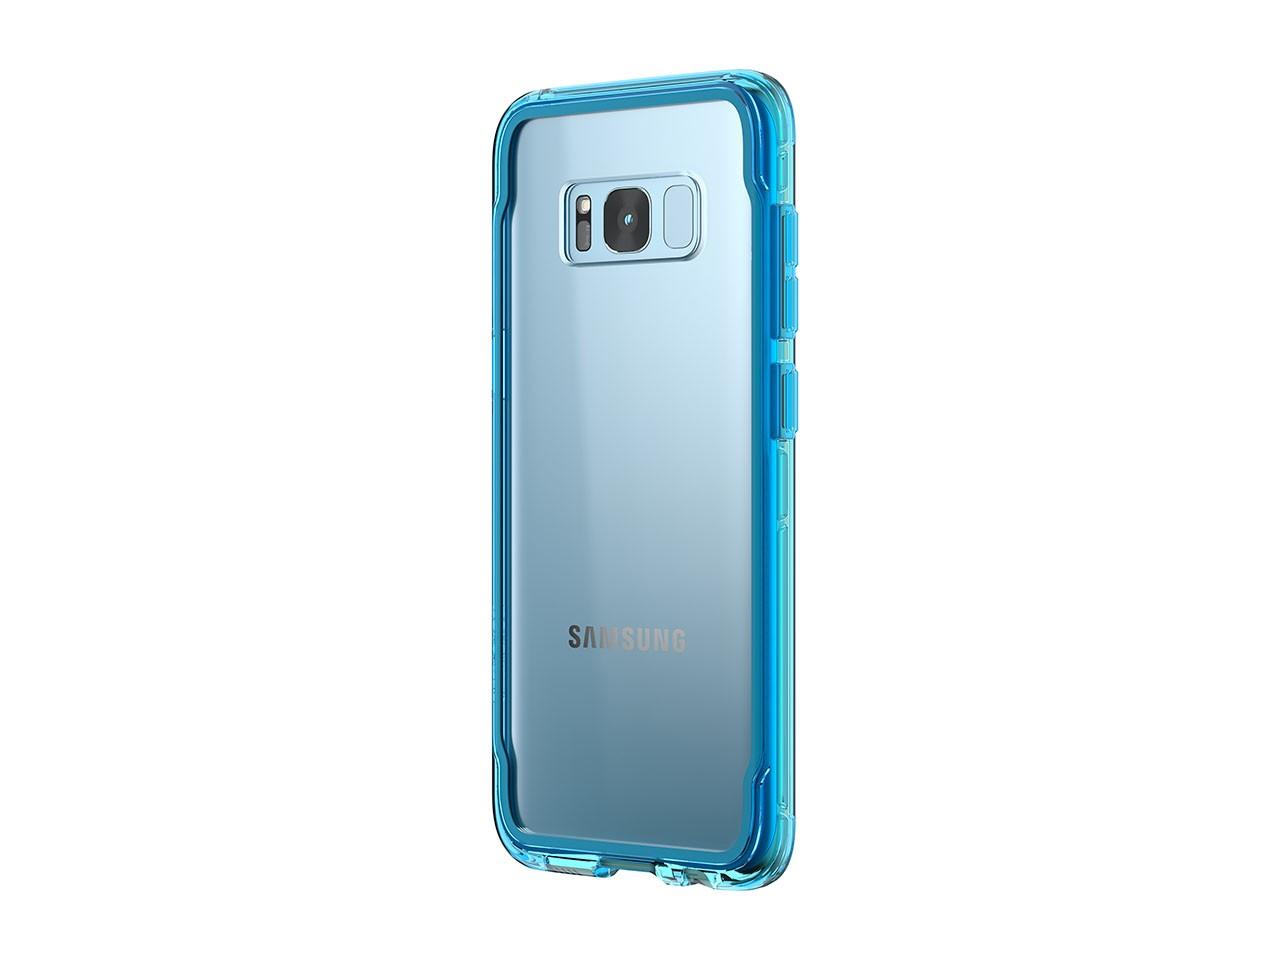 survivor-clear-samsung-galaxy-s8-plus-coral-blue-back-angled.jpg